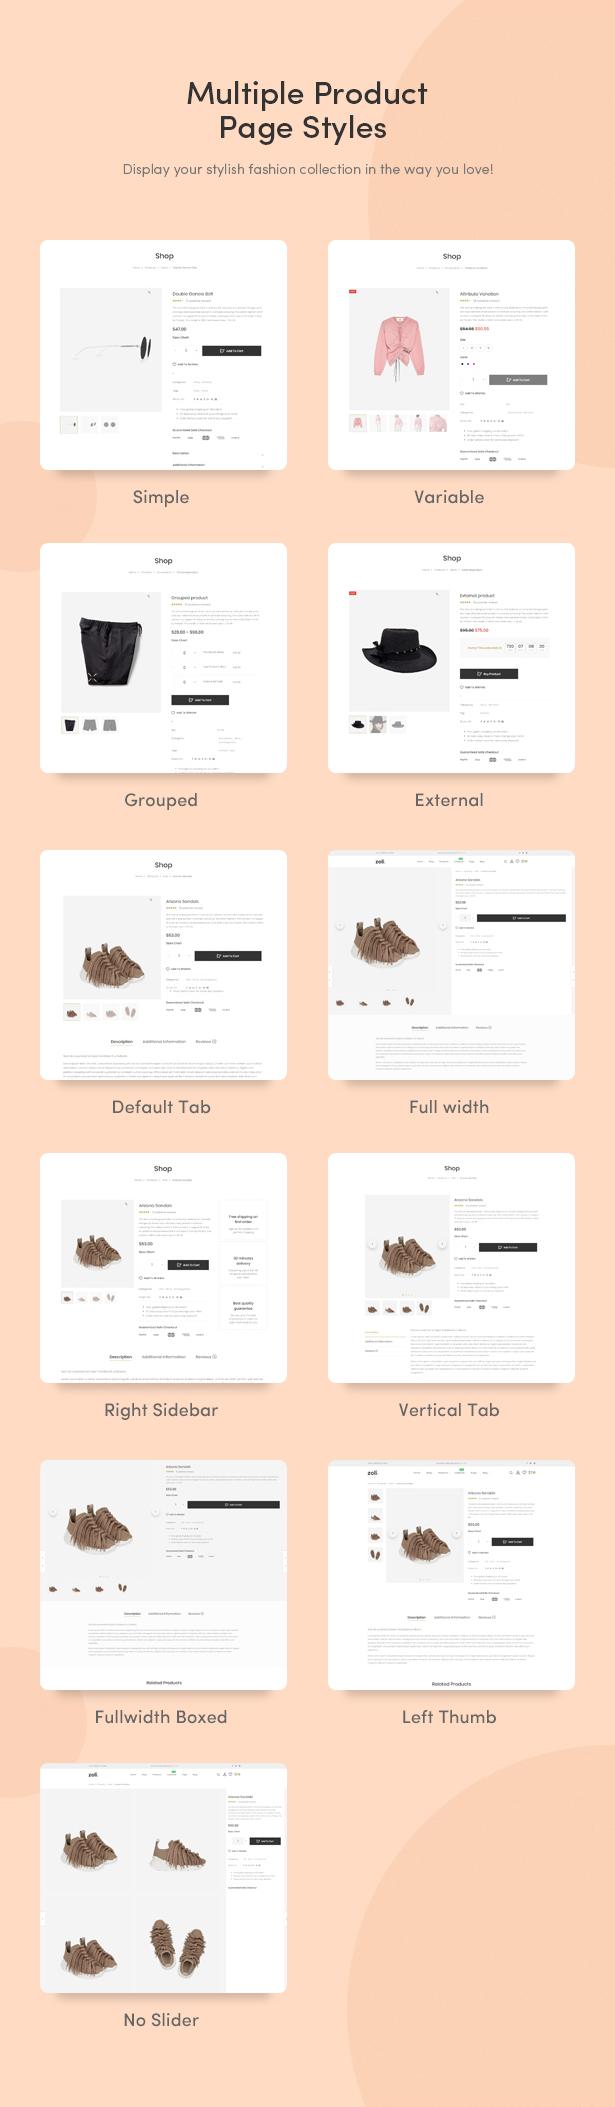 Numerous Product Page Types Designed Beautifully - Zoli - Minimal & Modern Fashion WooCommerce WordPress Theme